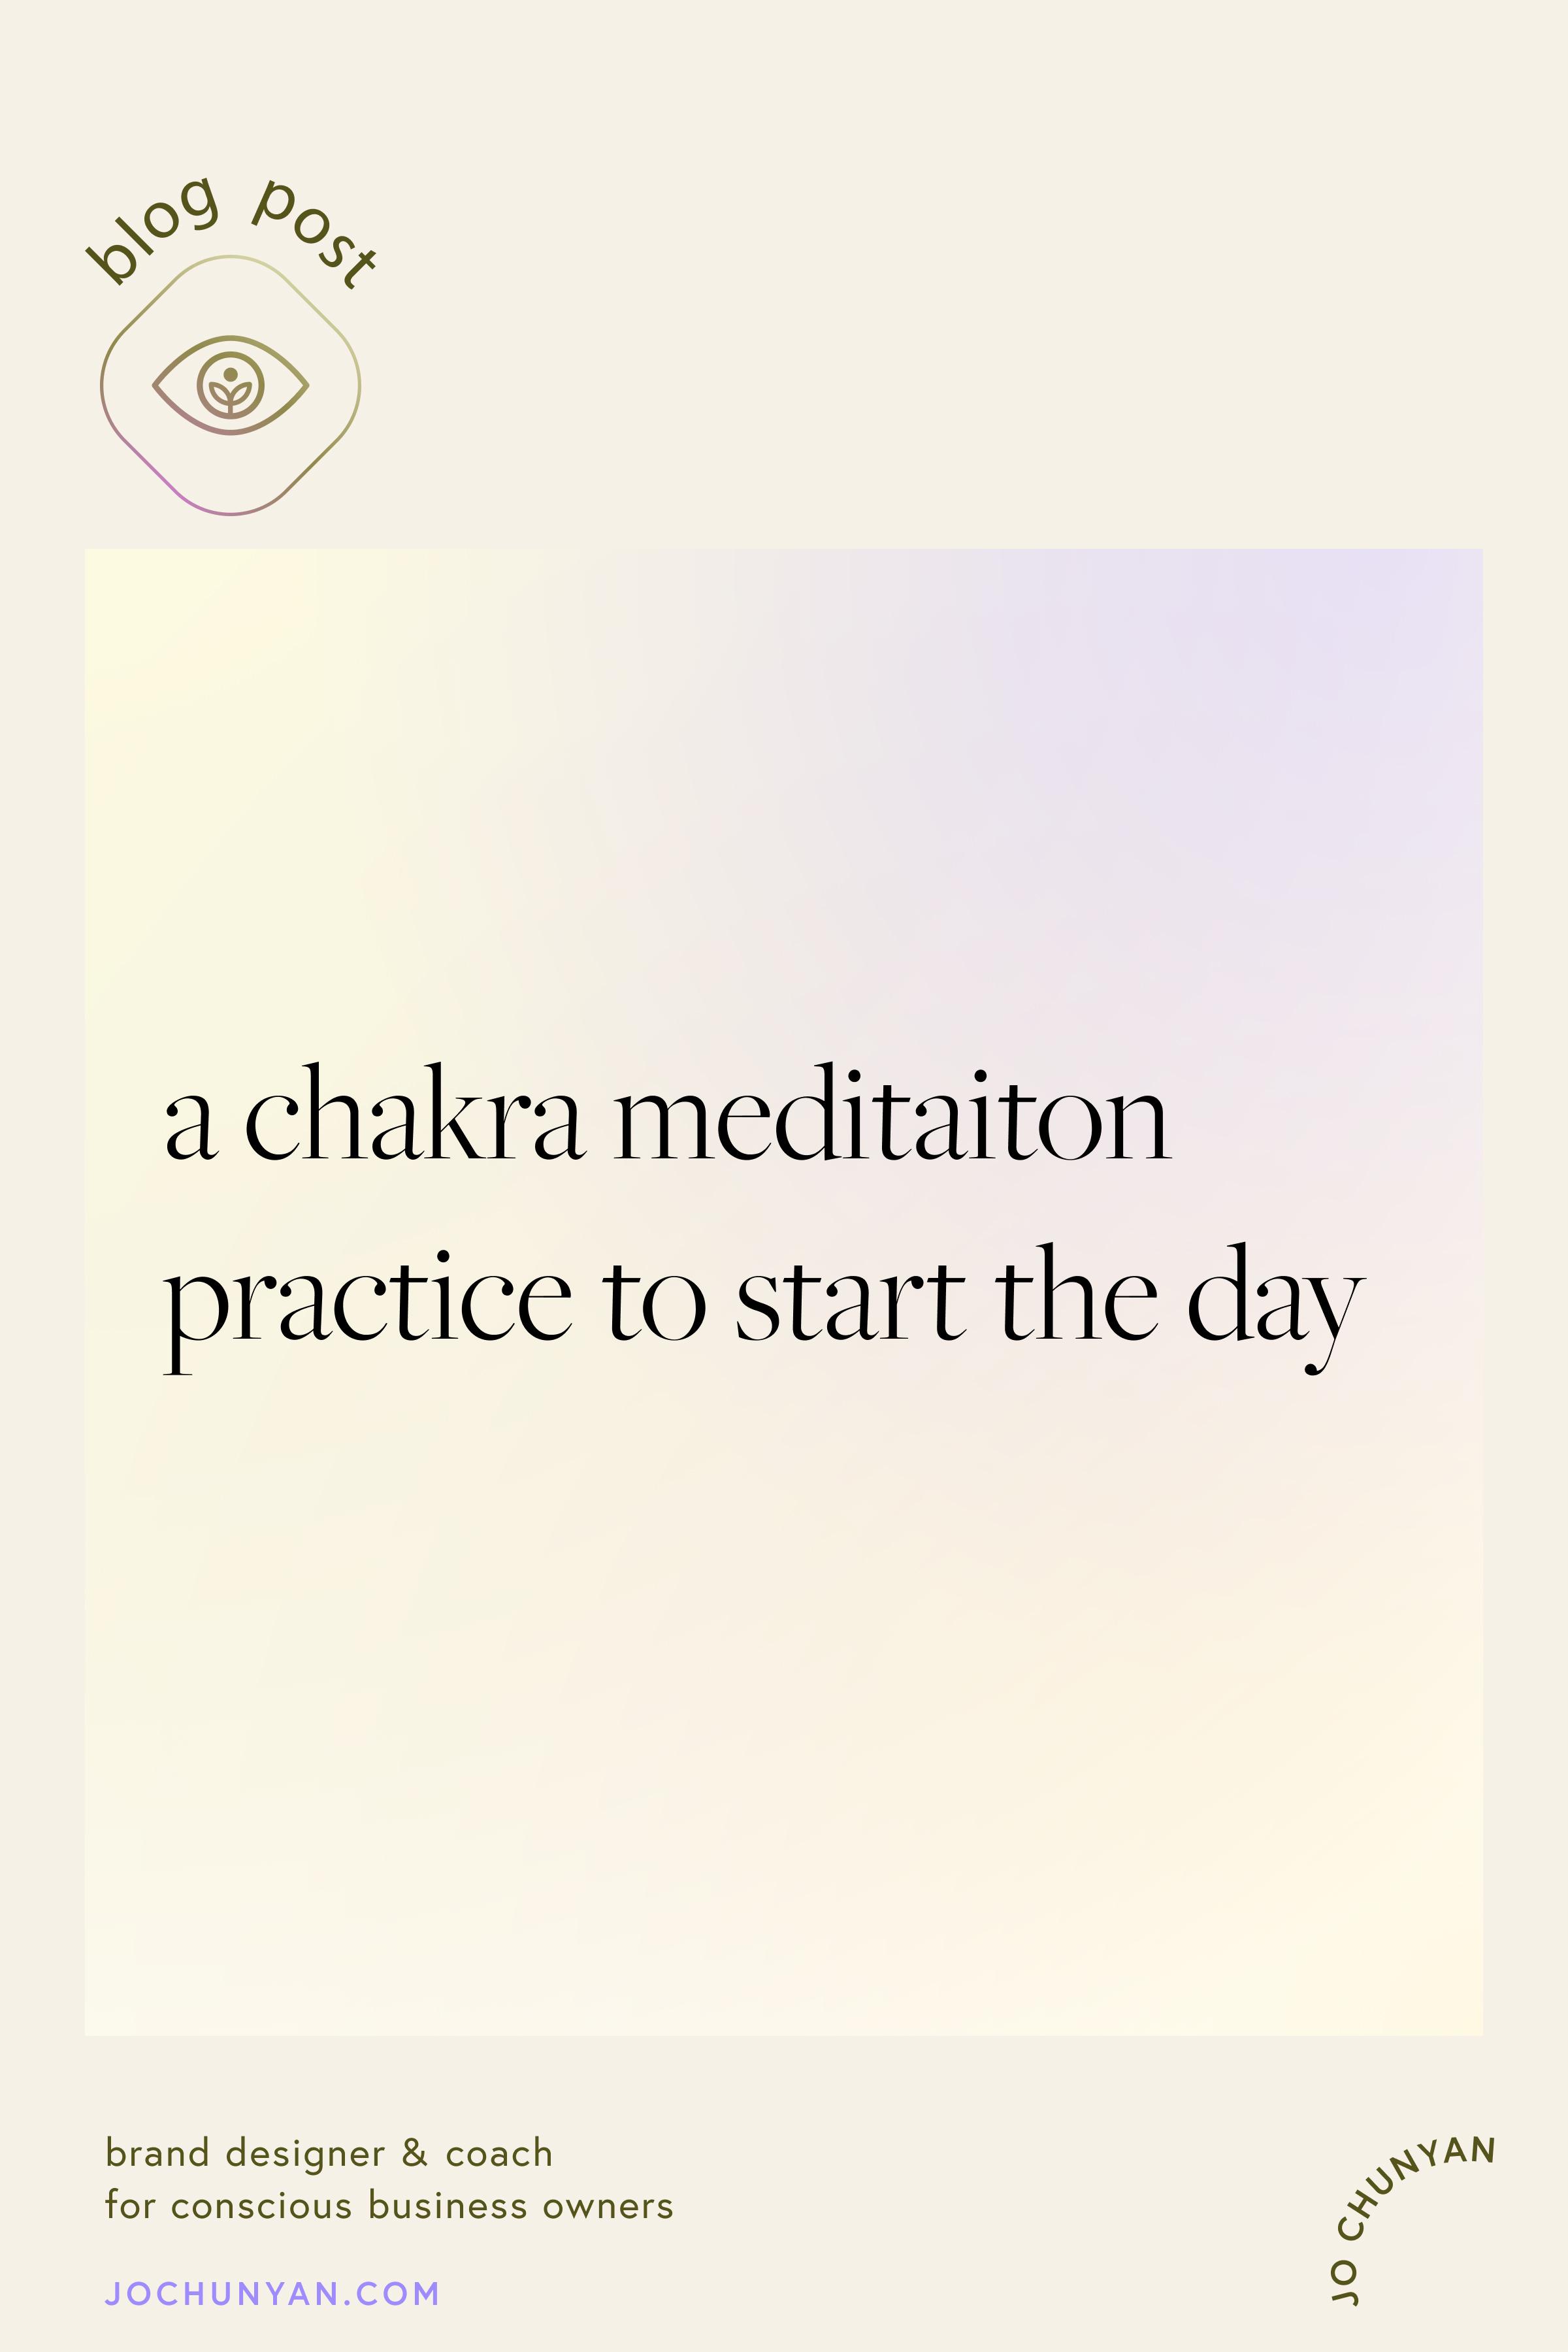 My Chakra Meditation Practice